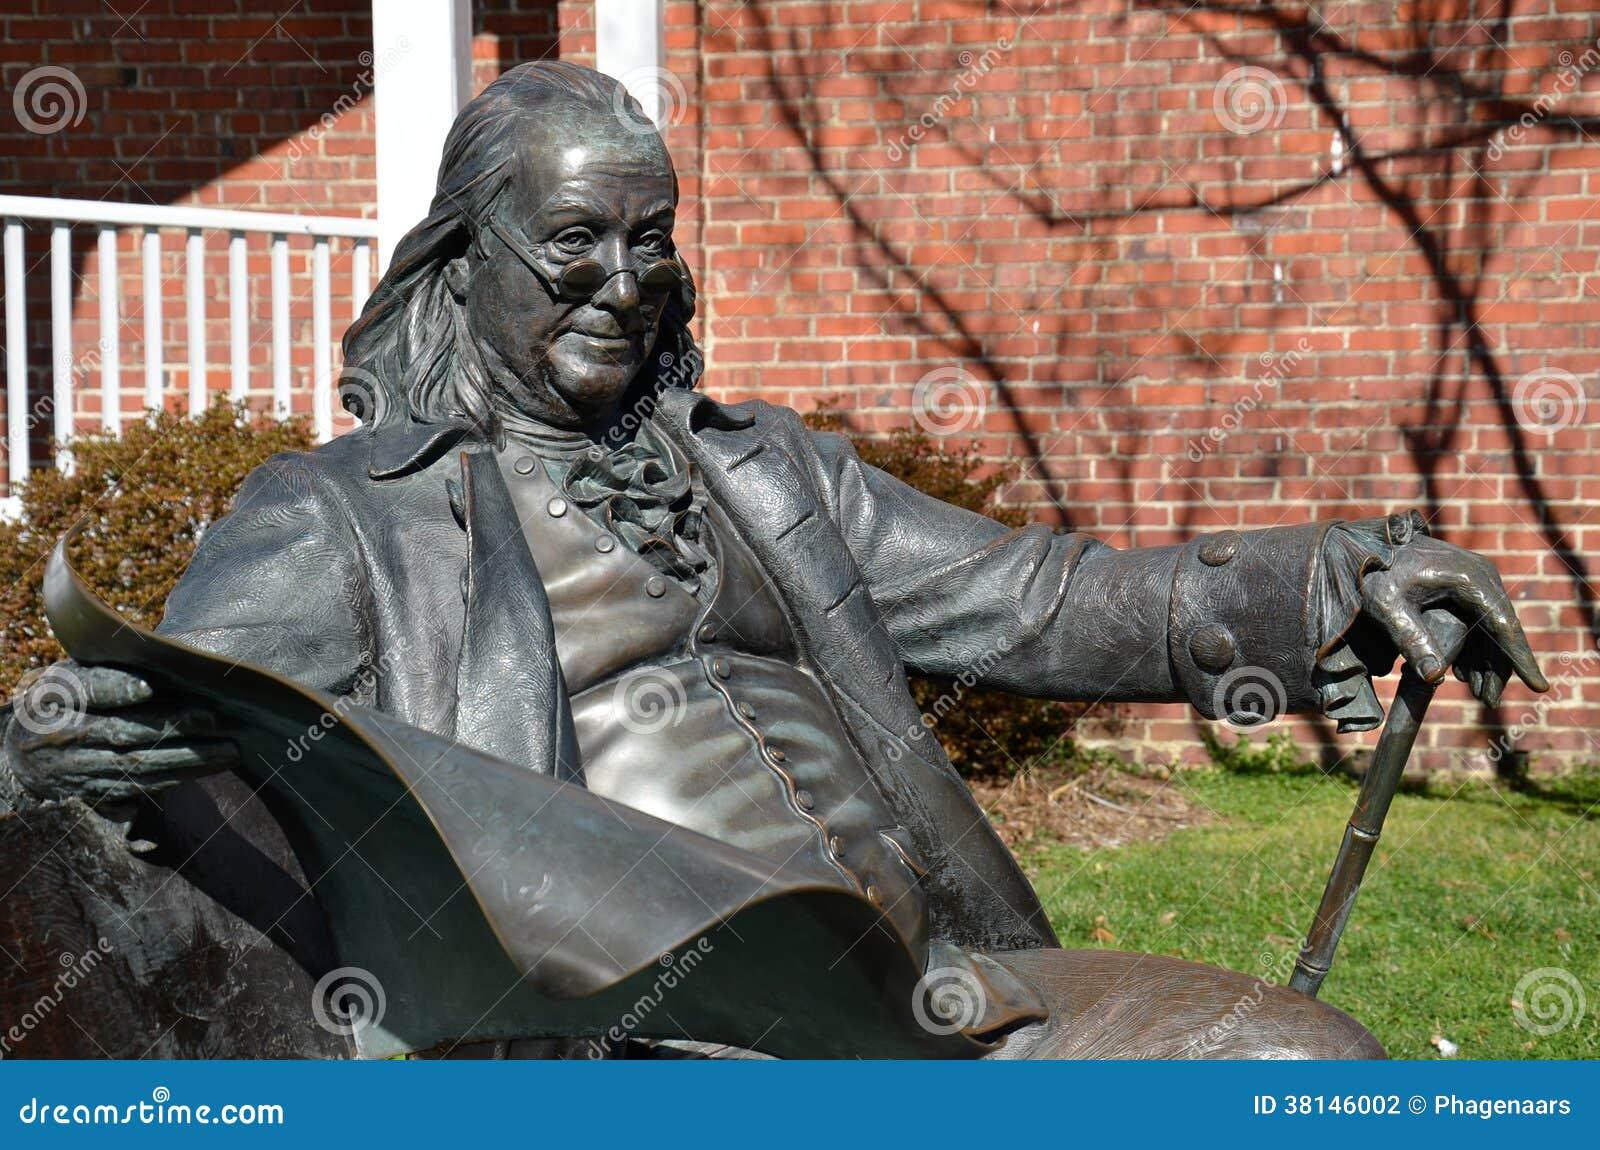 Benjamin Franklin, Main Street, Smithfield, VA